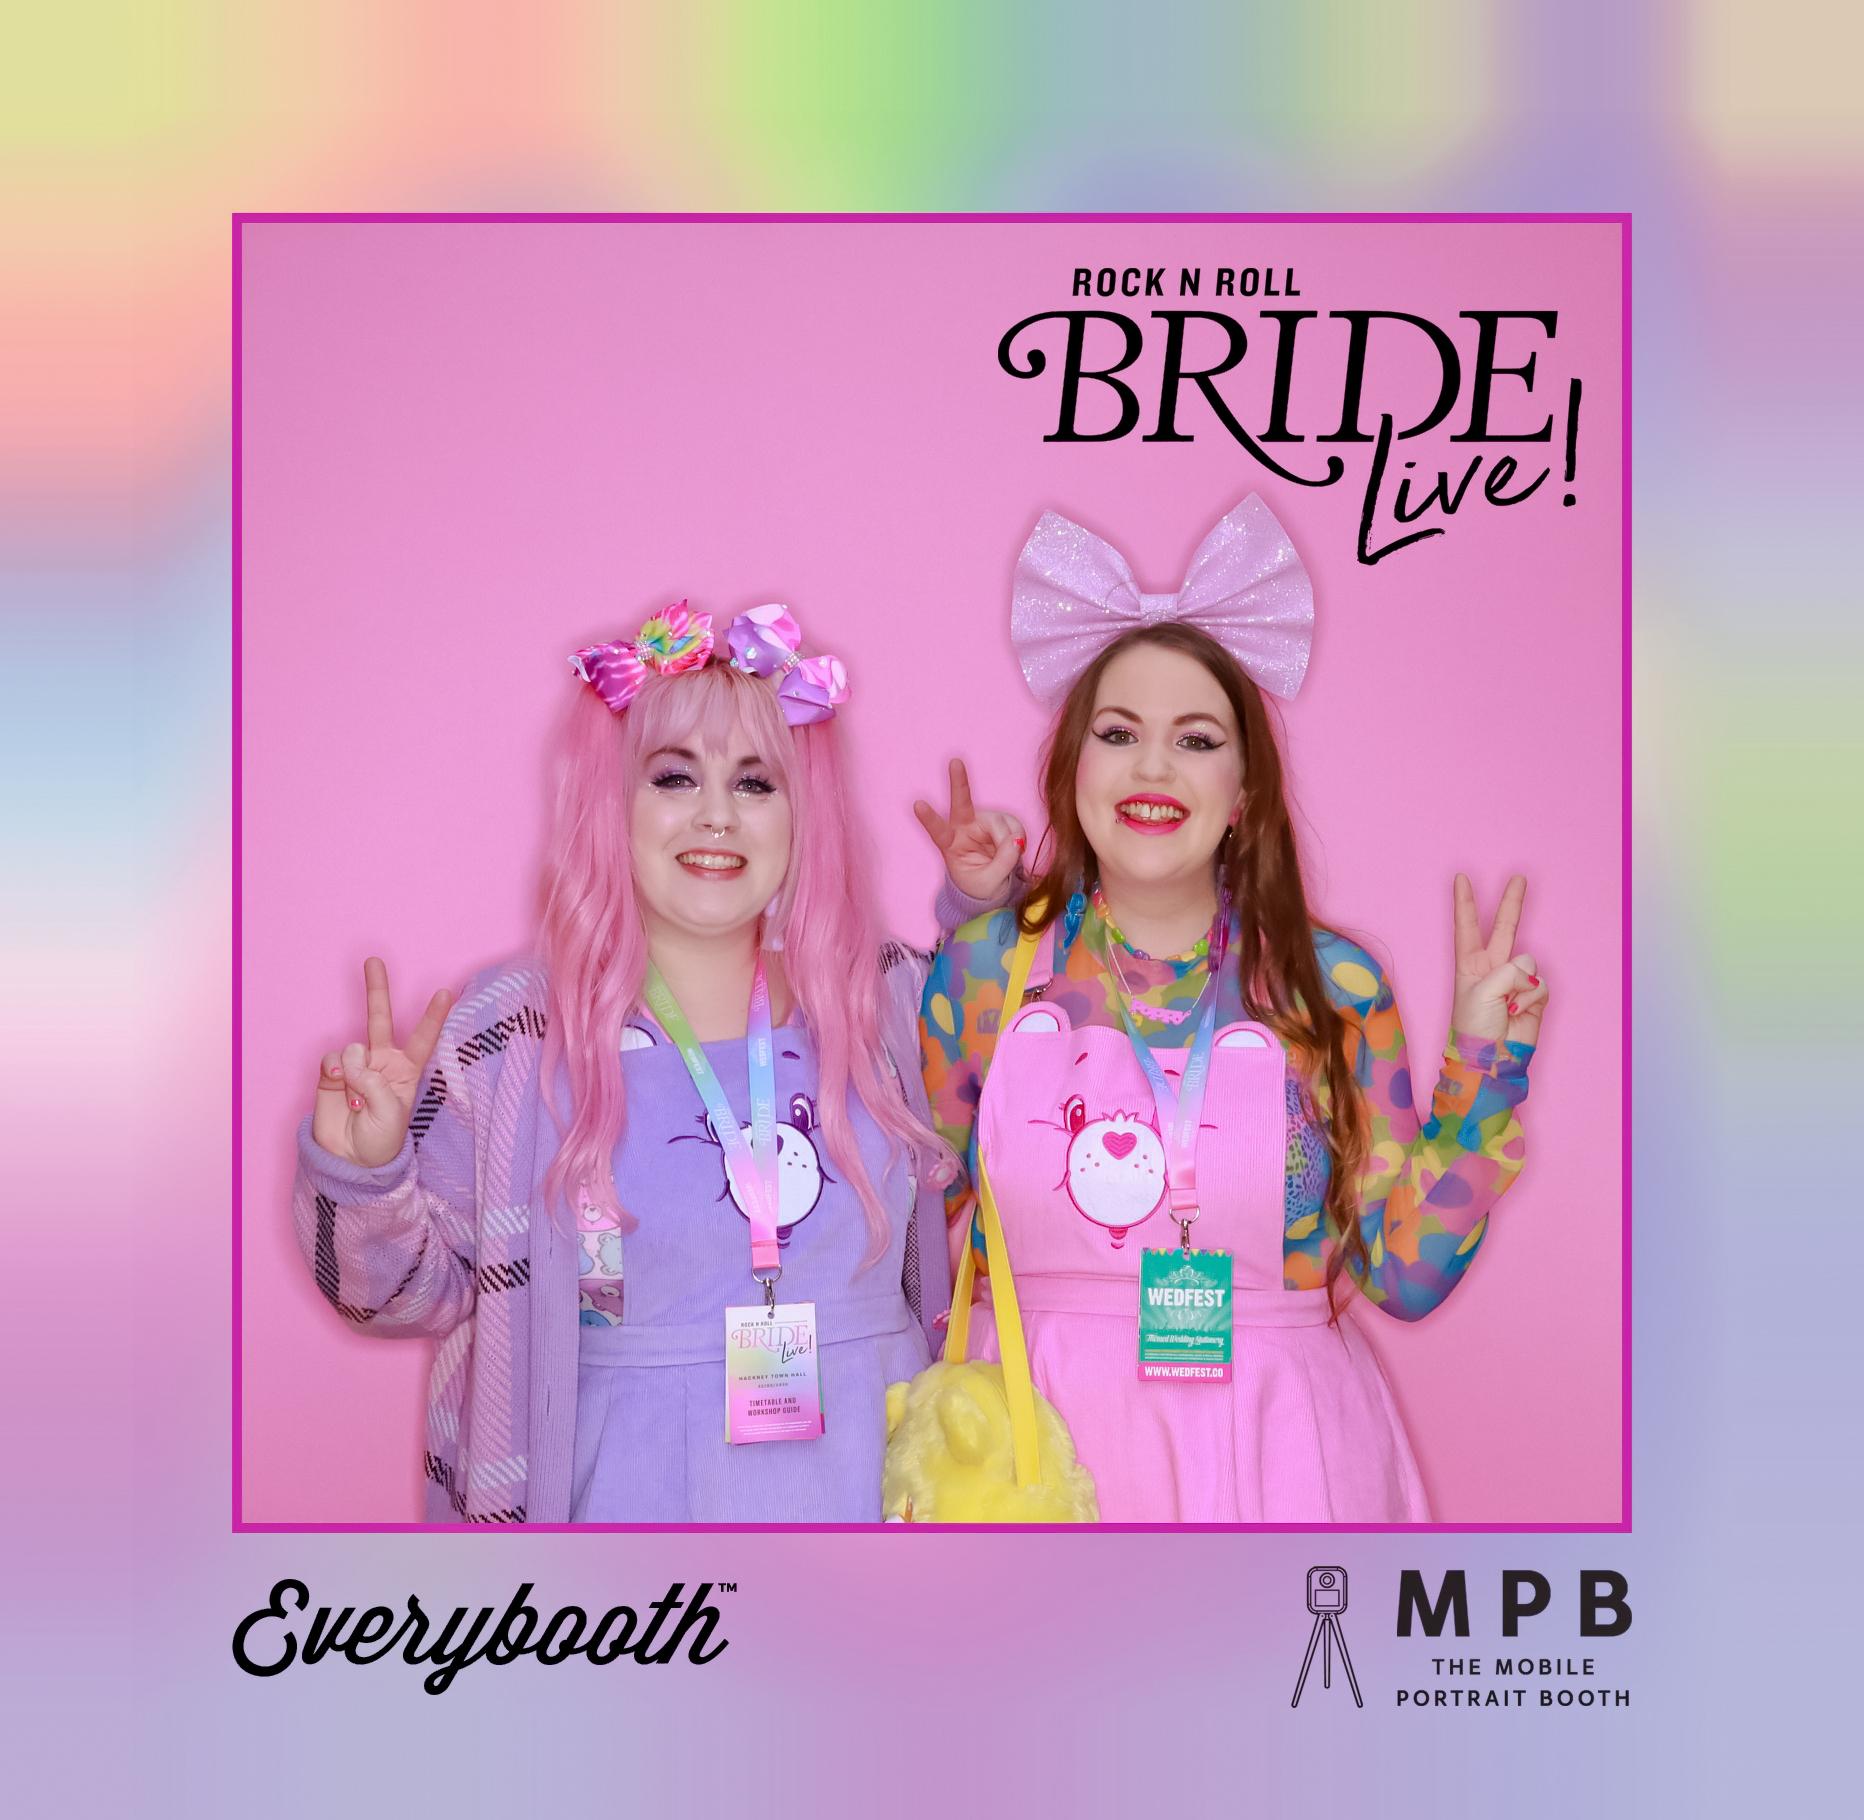 wedfest lanyard rock n roll bride live